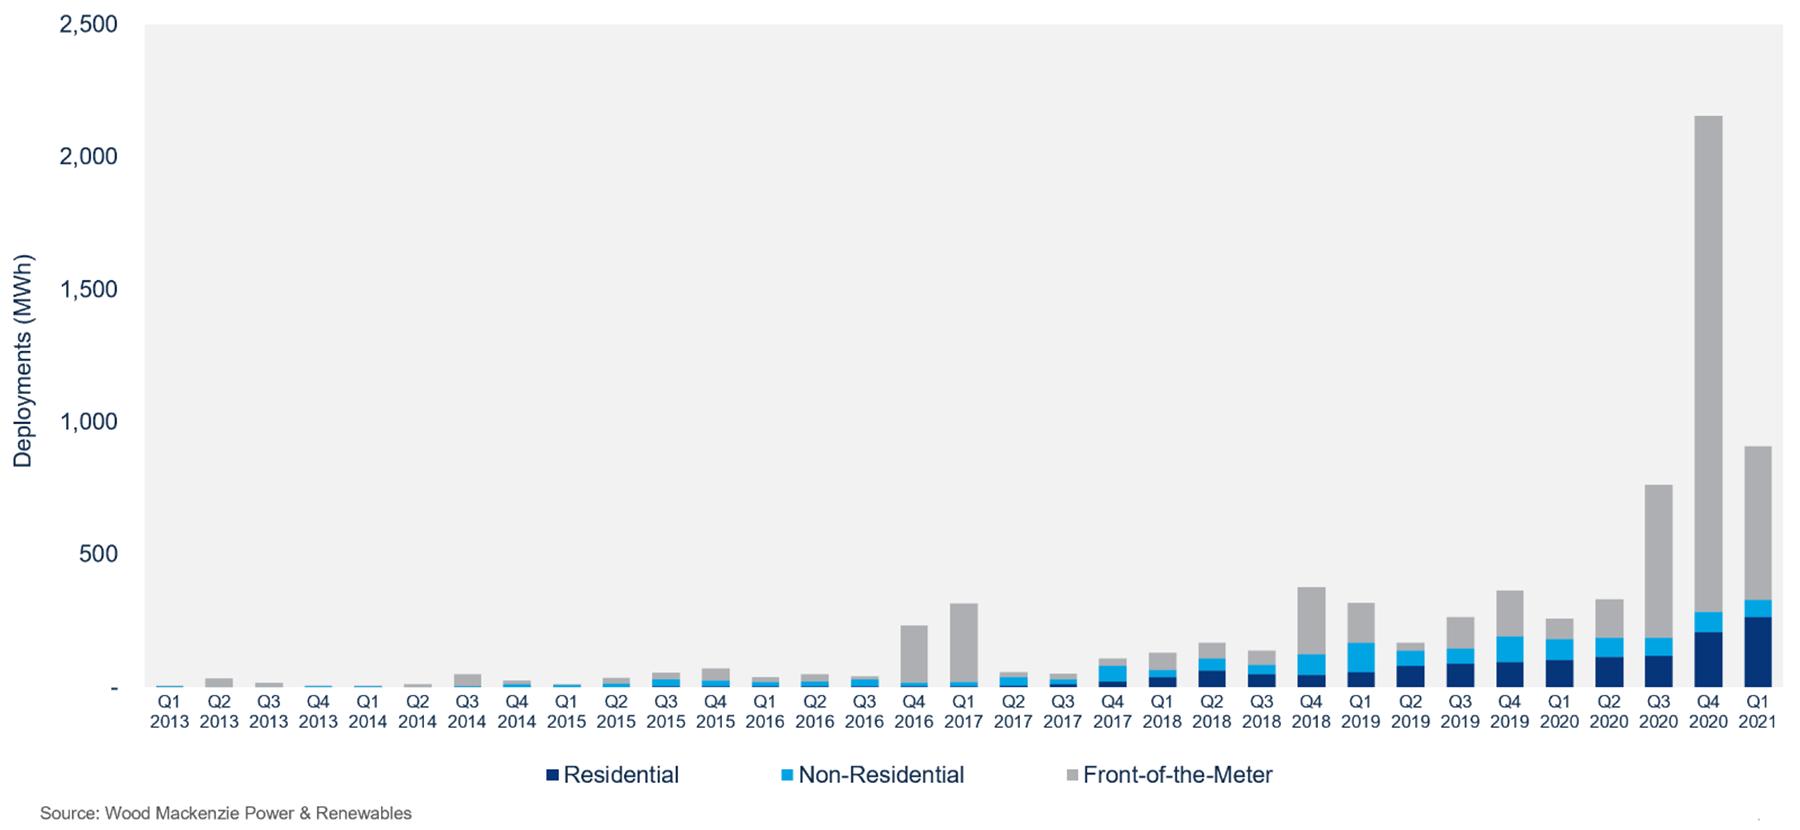 Quarterly US Energy Storage Deployments (MWh), 2013 - 2021